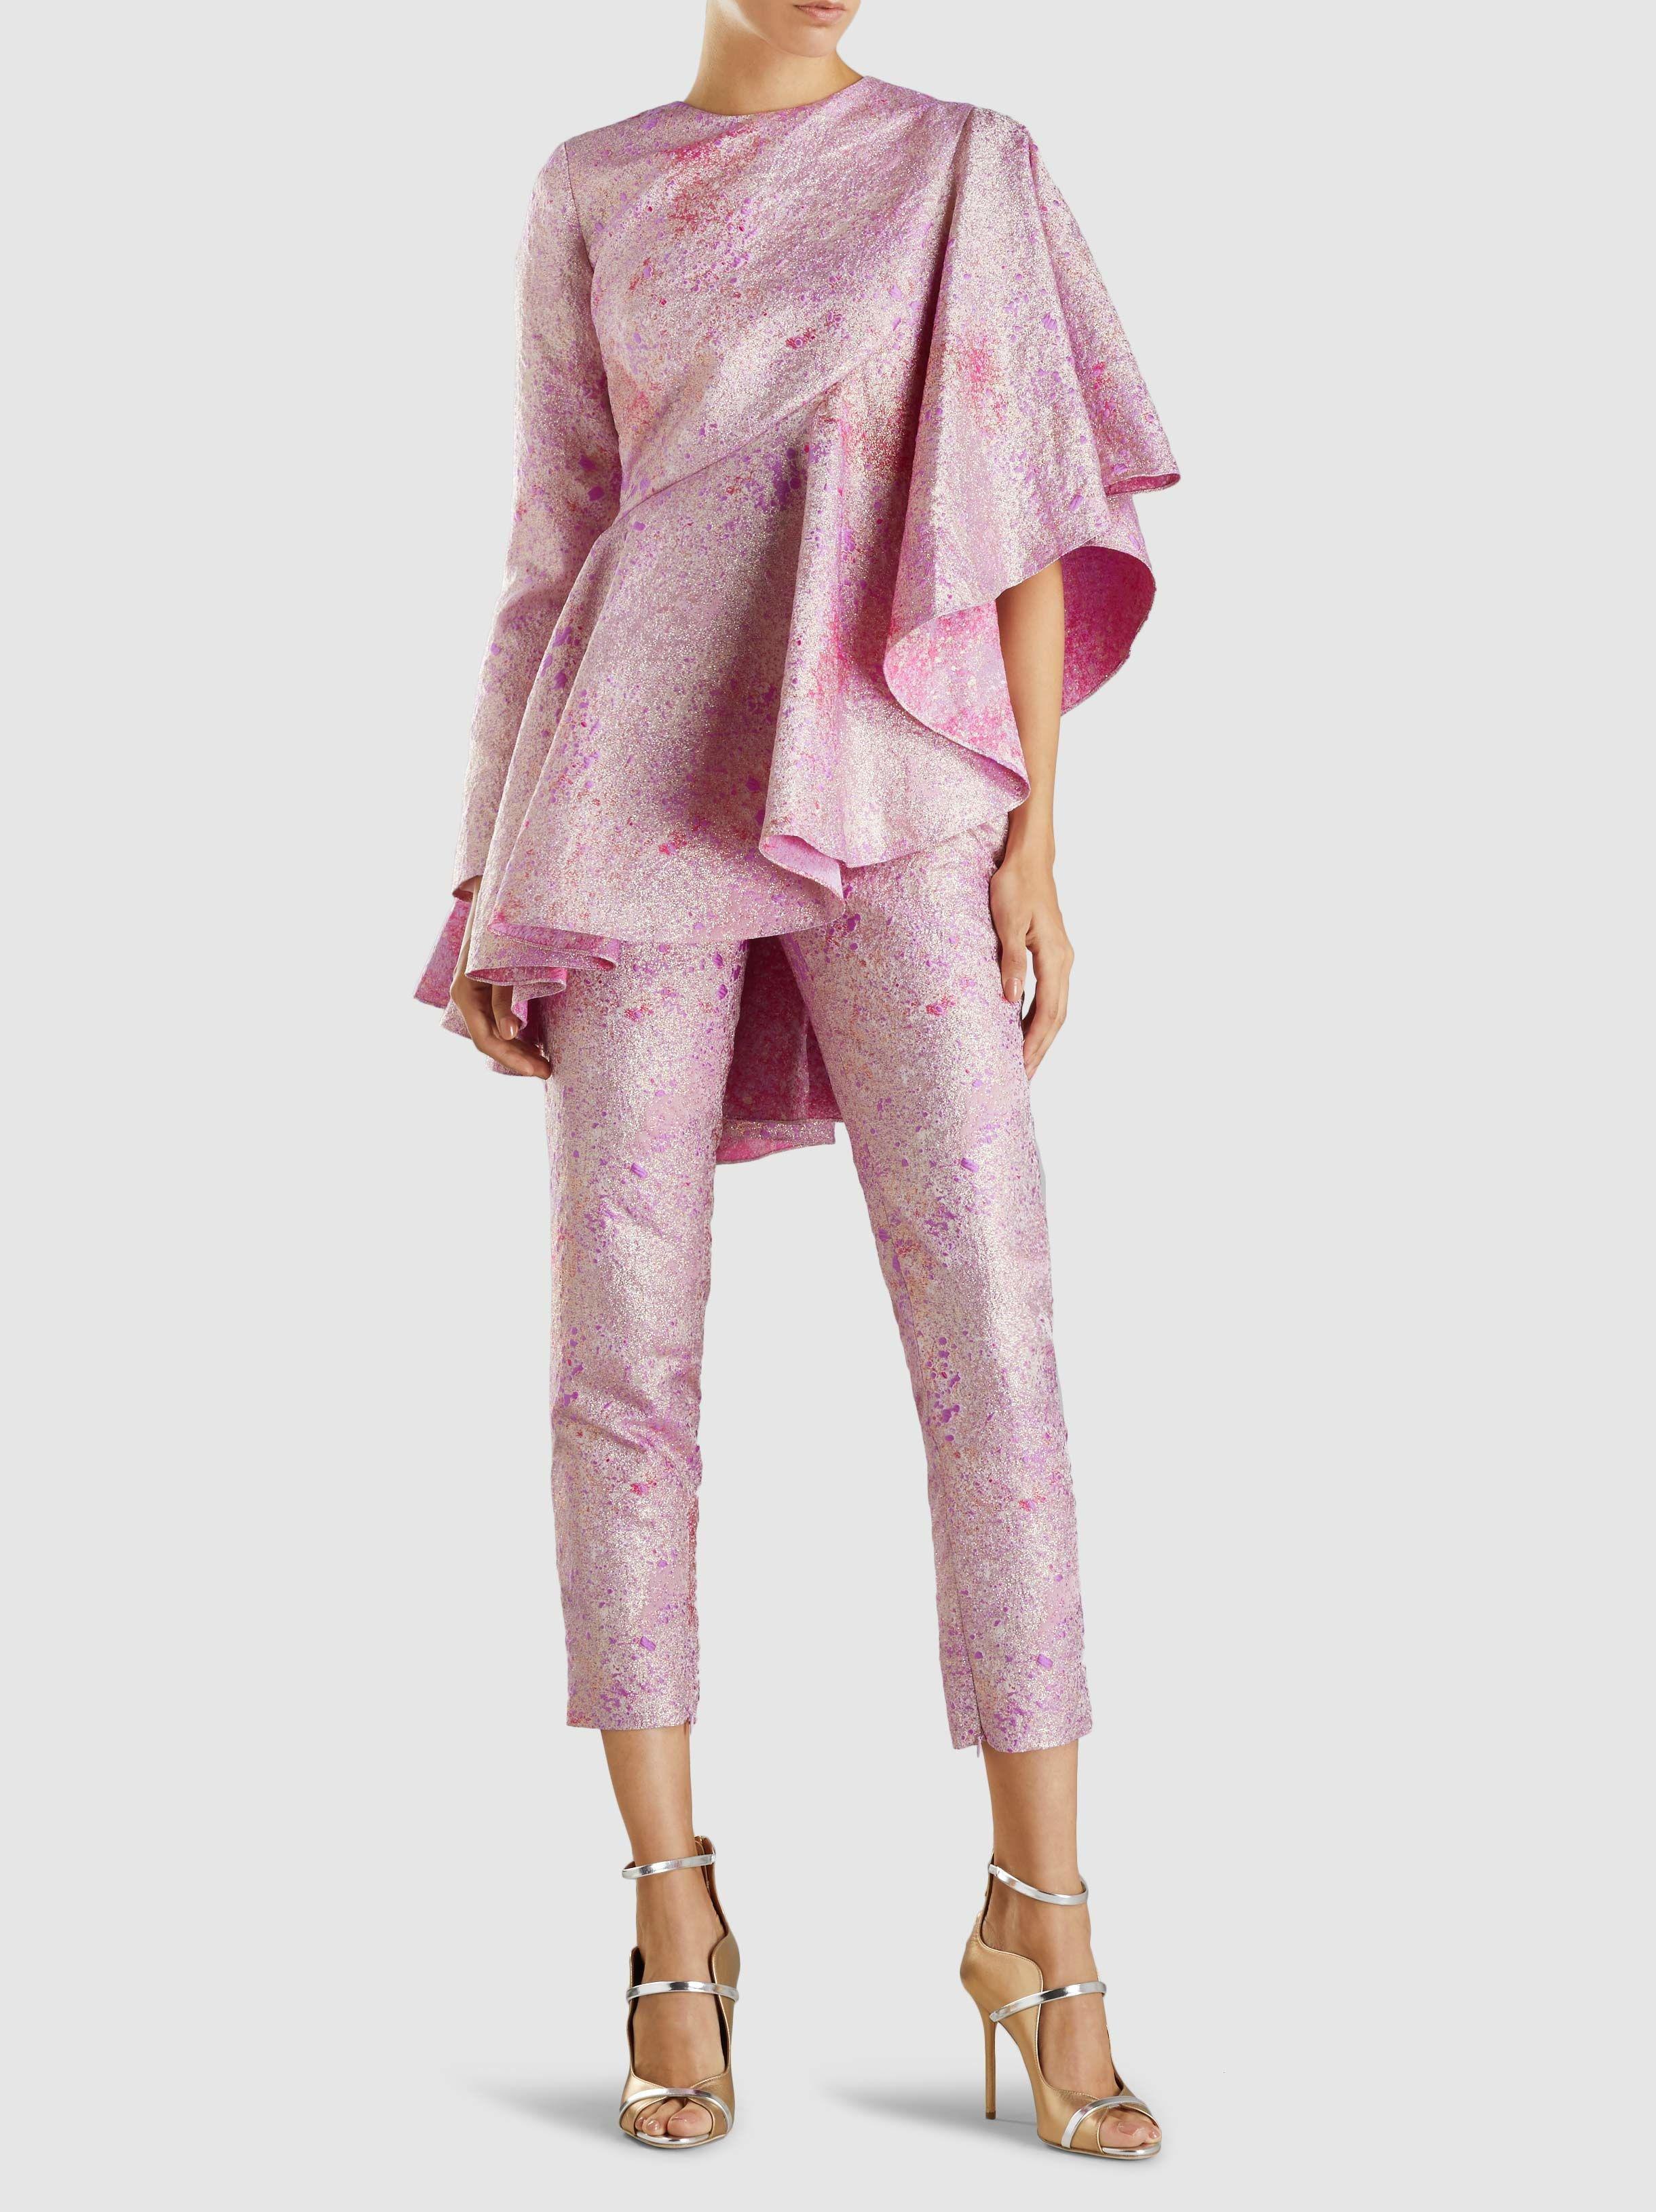 4c90fa2550 SemSem - Pink Camille Brocade Metallic Cigarette Pants - Lyst. View  fullscreen